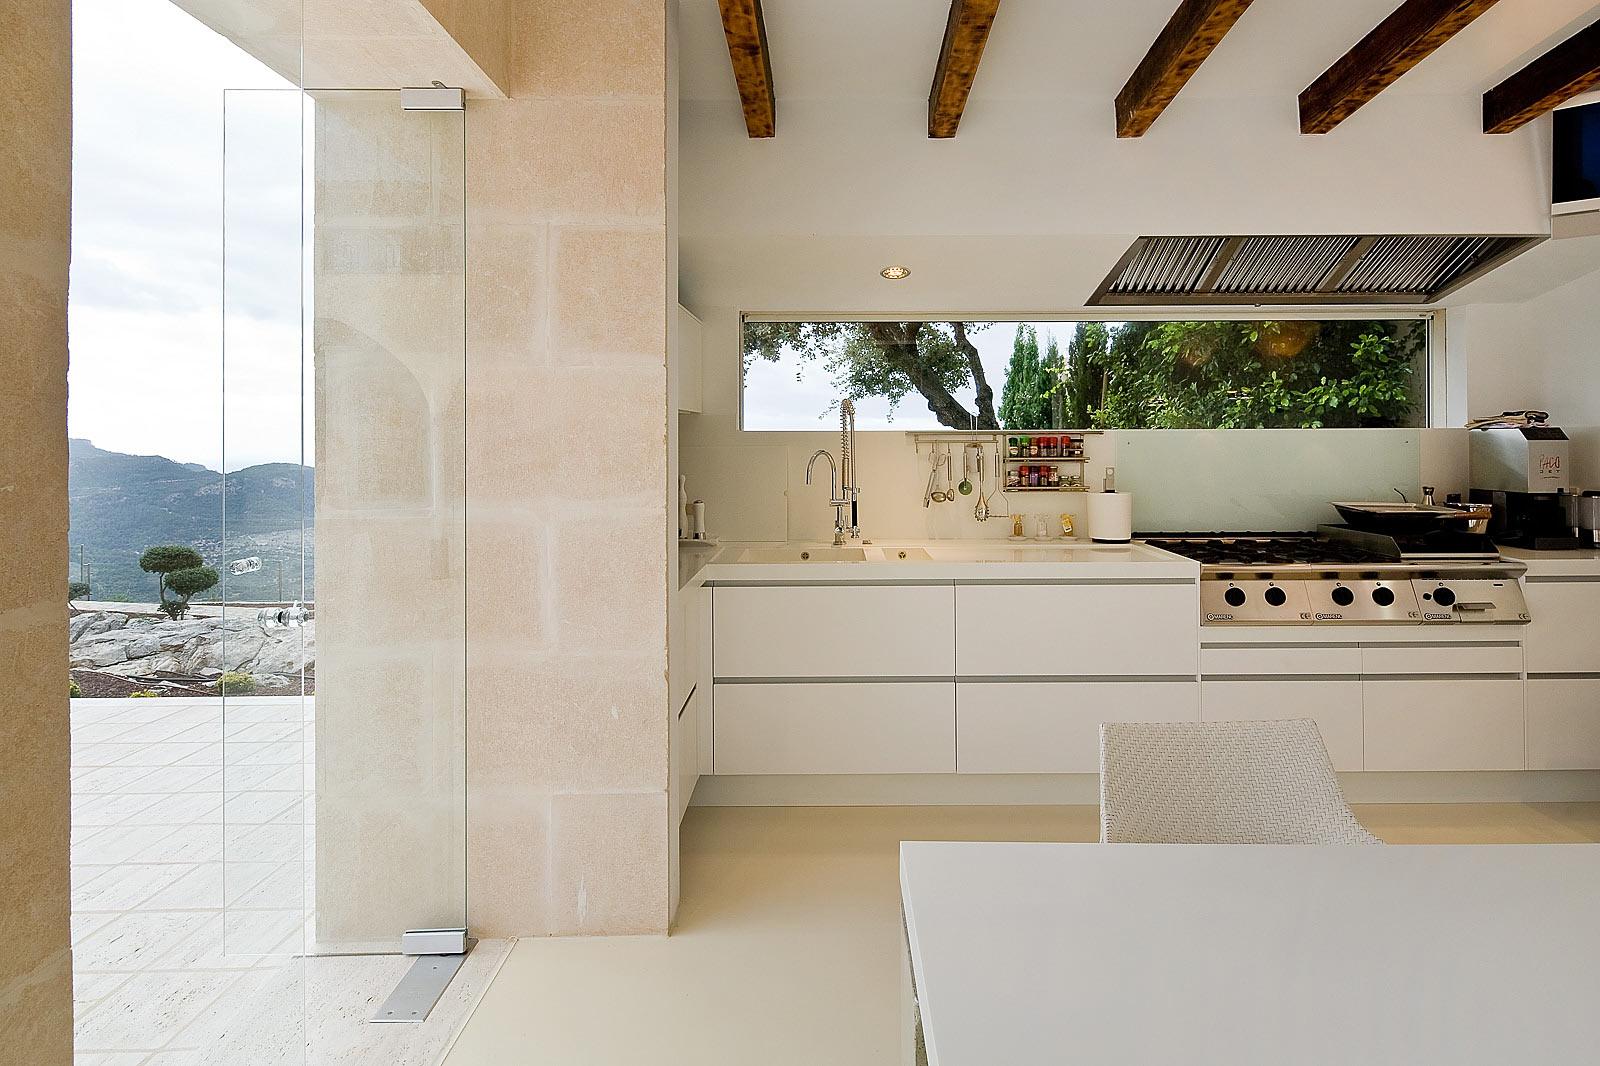 Architekturfotograf auf Mallorca, Immobilien Fotograf